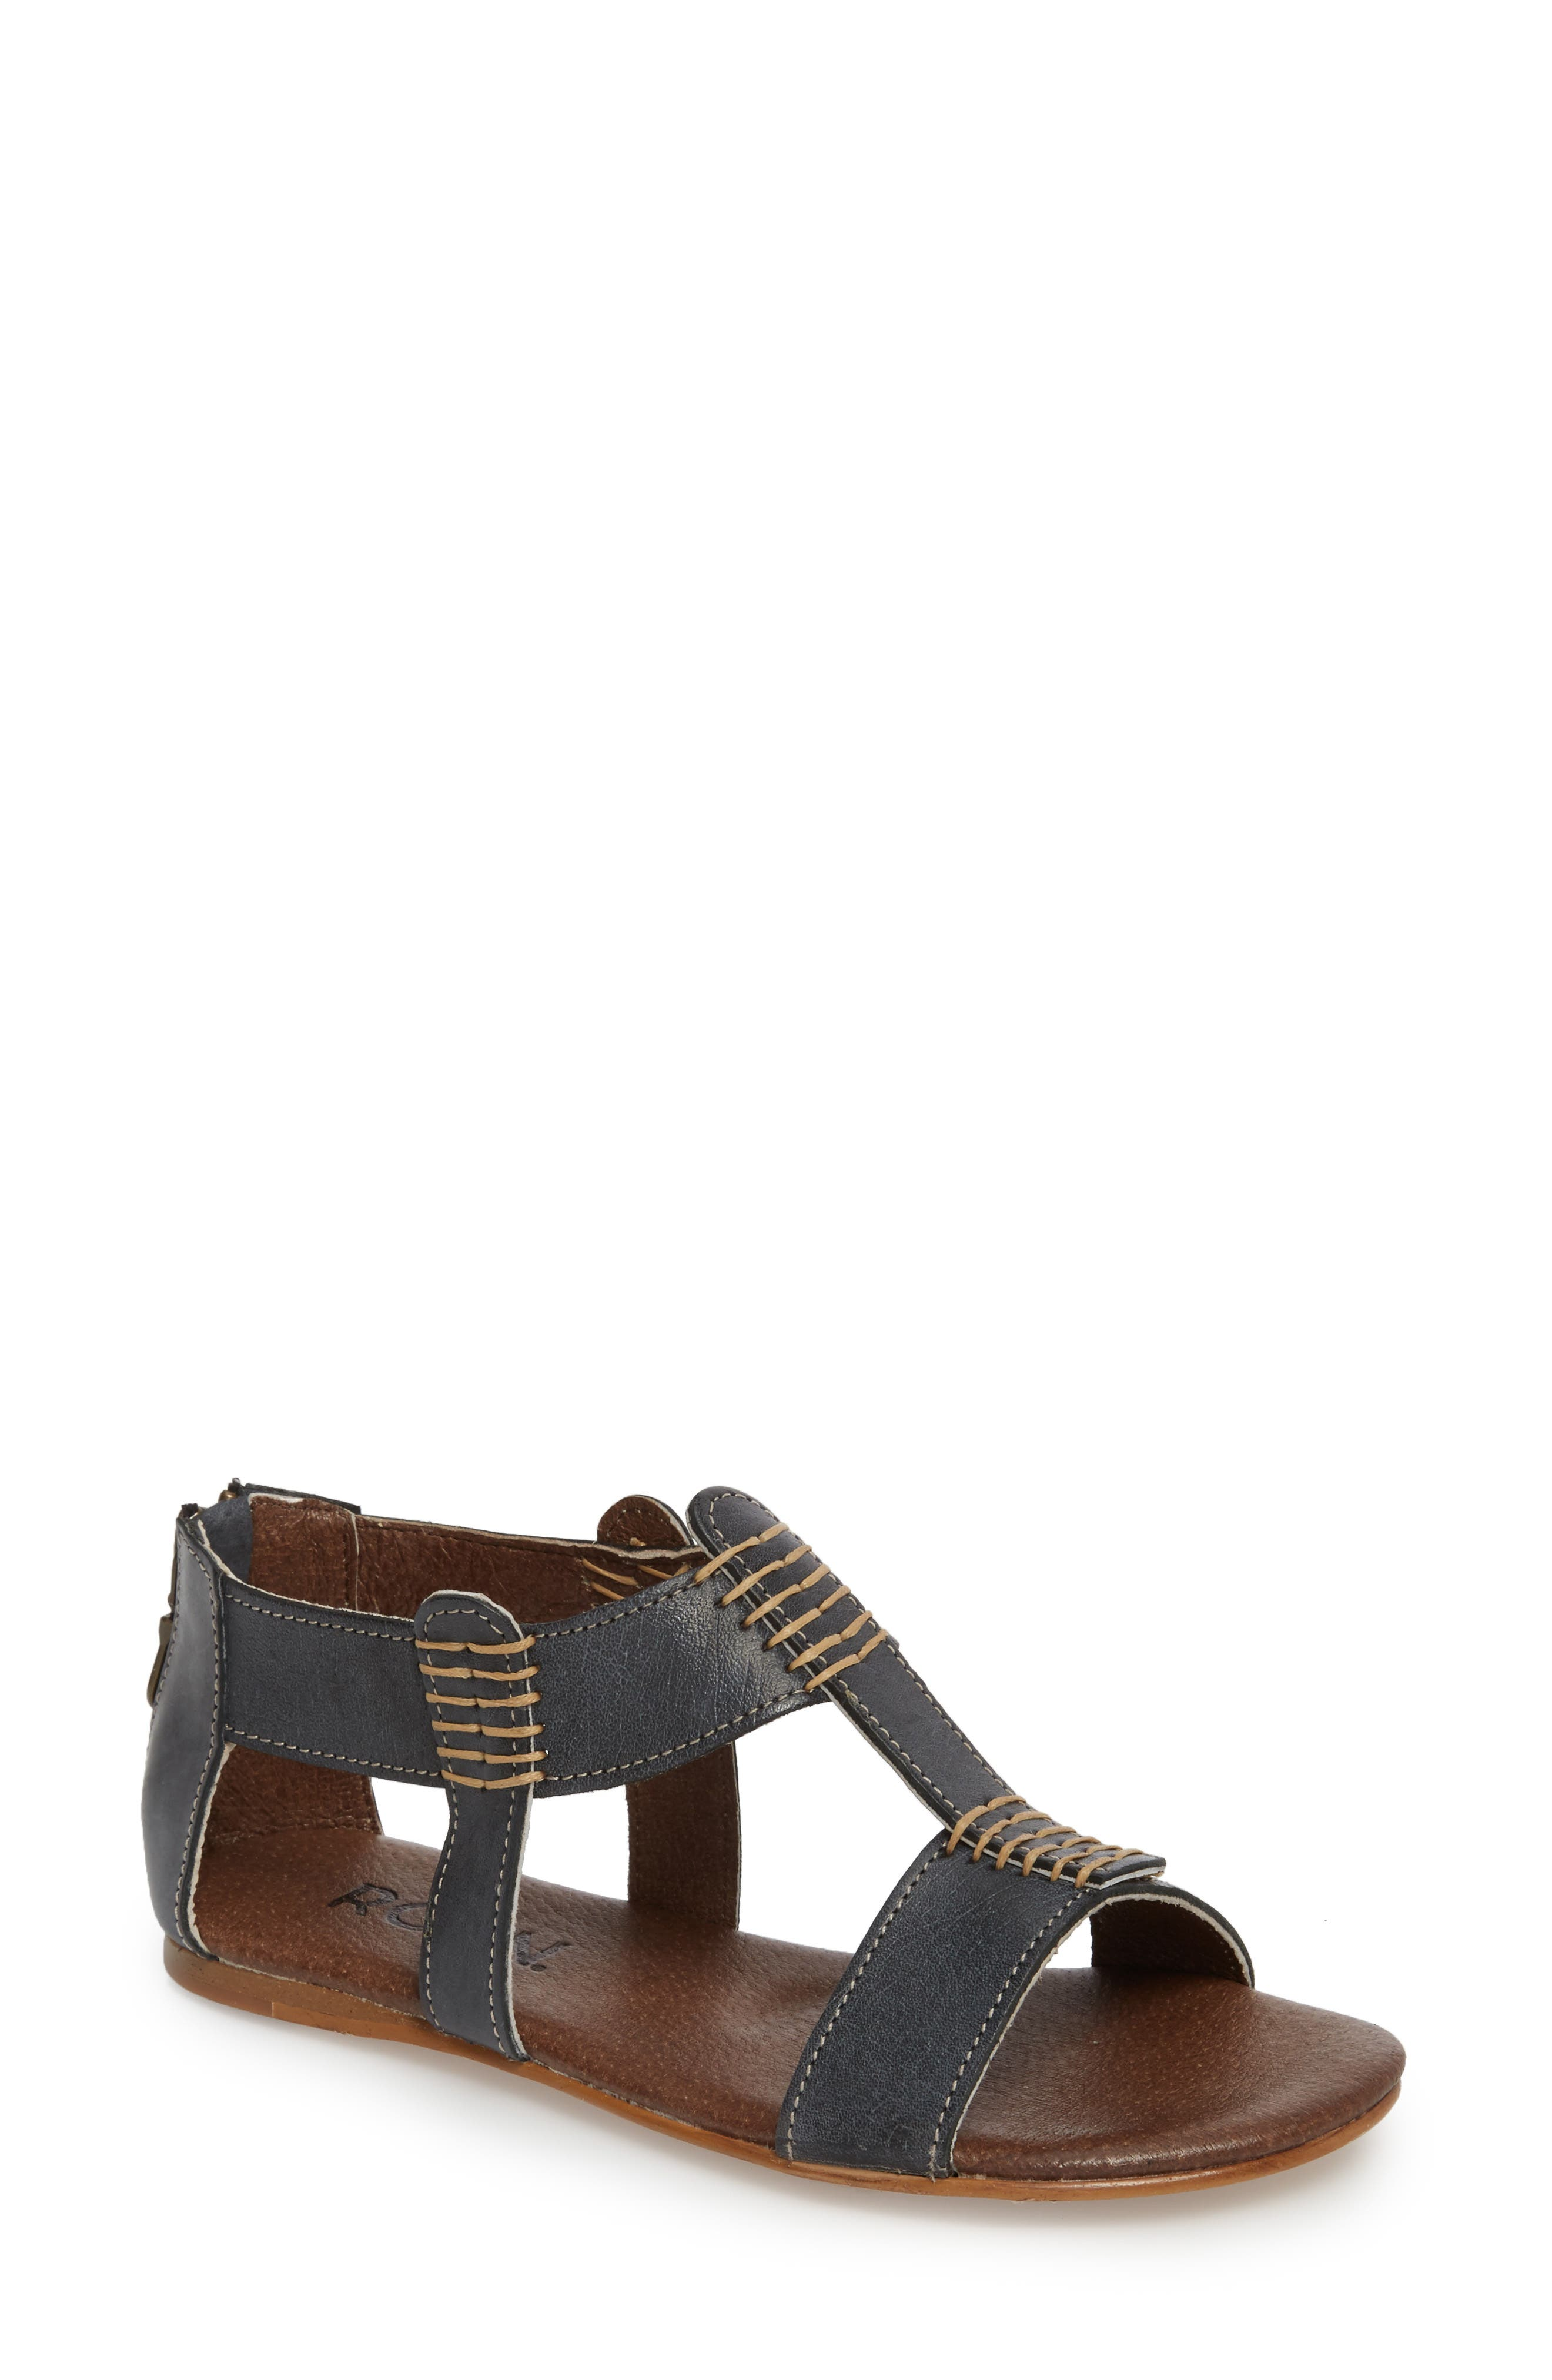 Jocelyn T-Strap Flat Sandal,                             Main thumbnail 1, color,                             Sydney Black